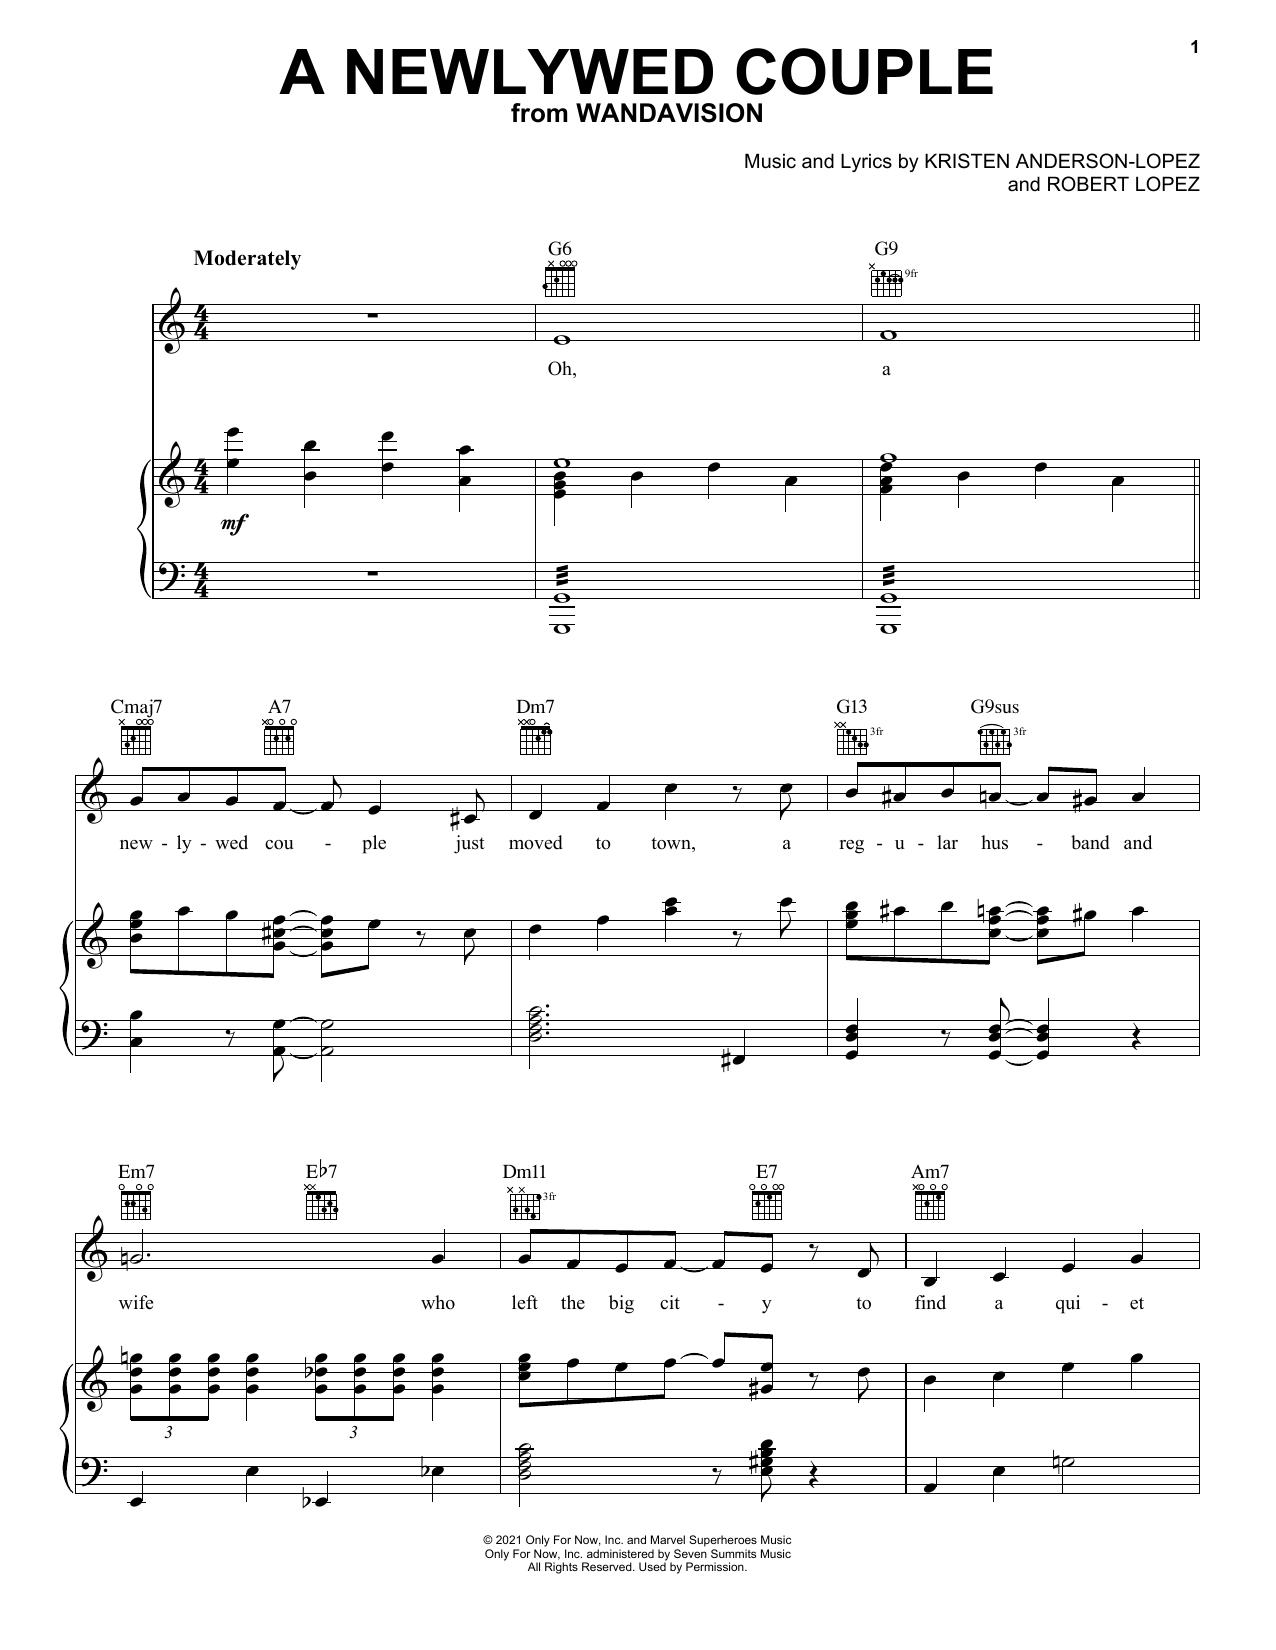 Kristen Anderson-Lopez & Robert Lopez A Newlywed Couple (from WandaVision) sheet music notes printable PDF score